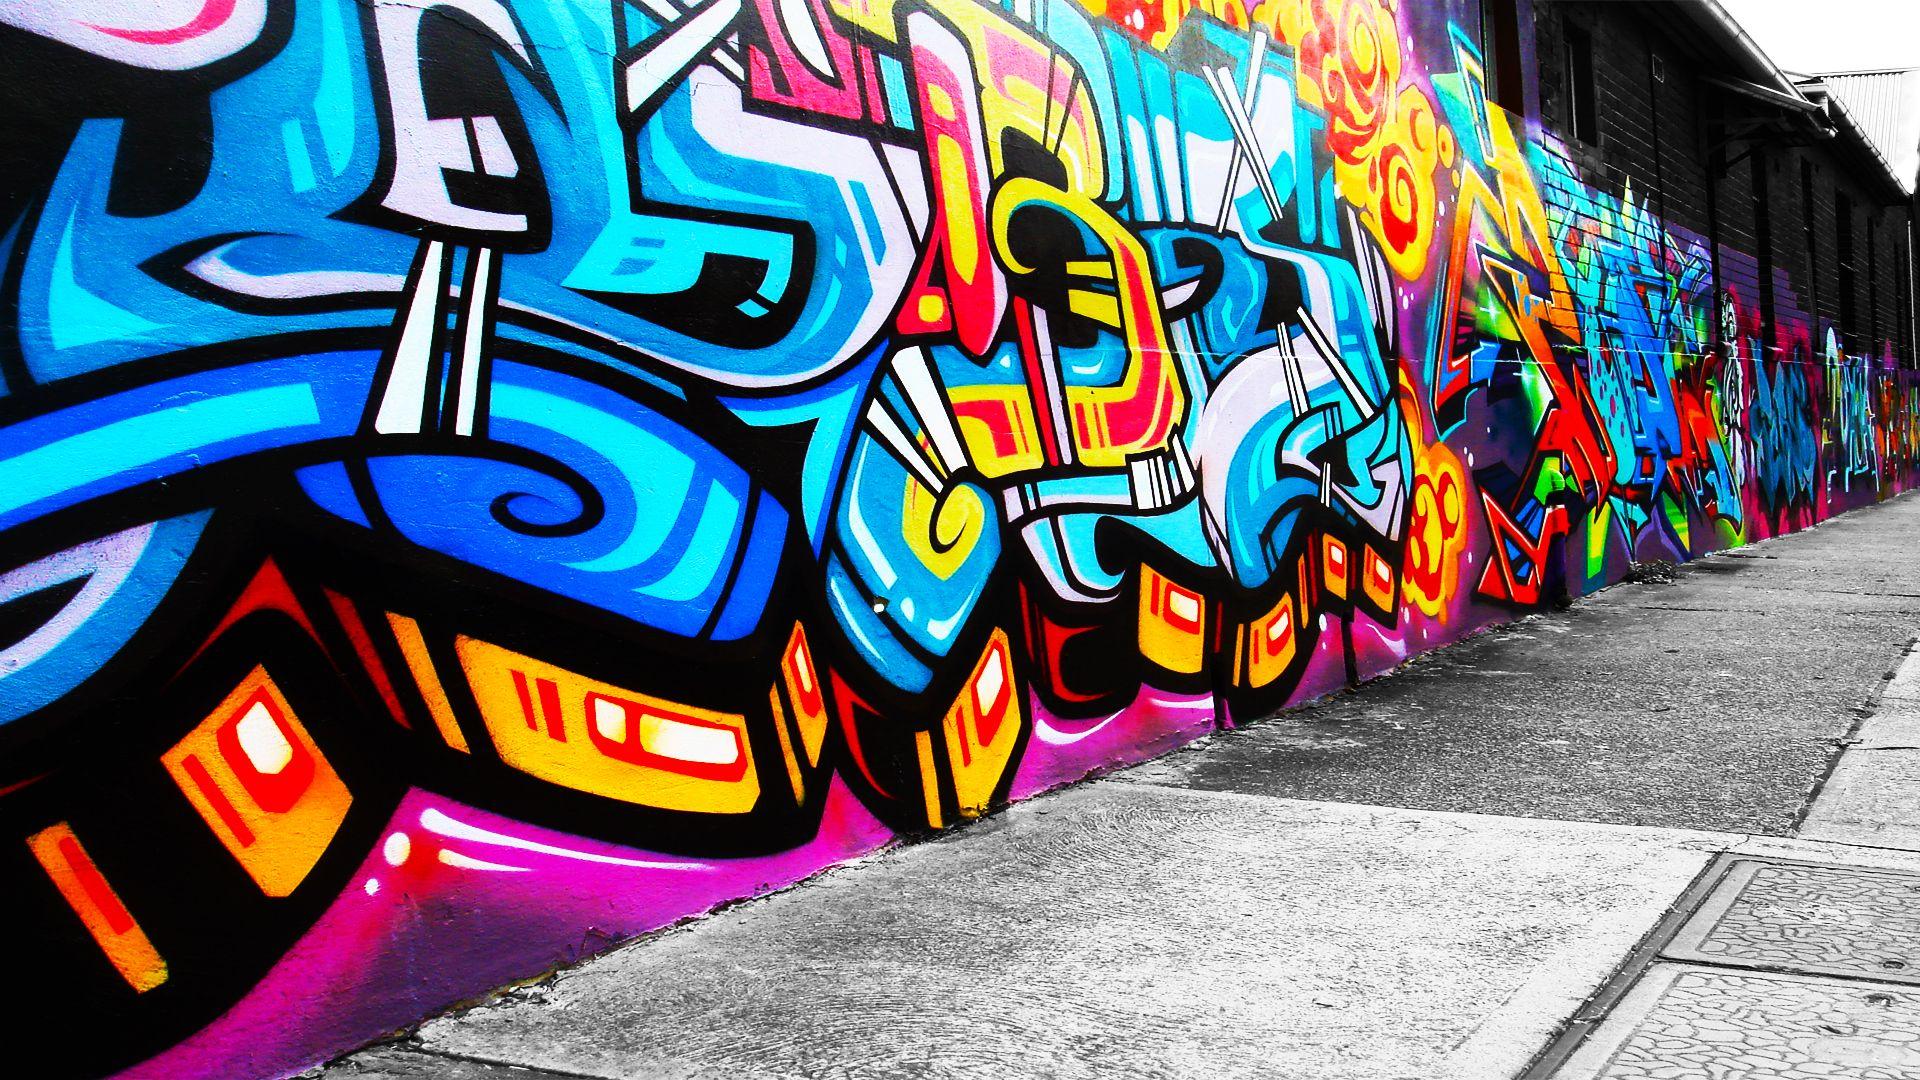 Graffiti art wallpaper - Graffiti Art Wallpaper 3